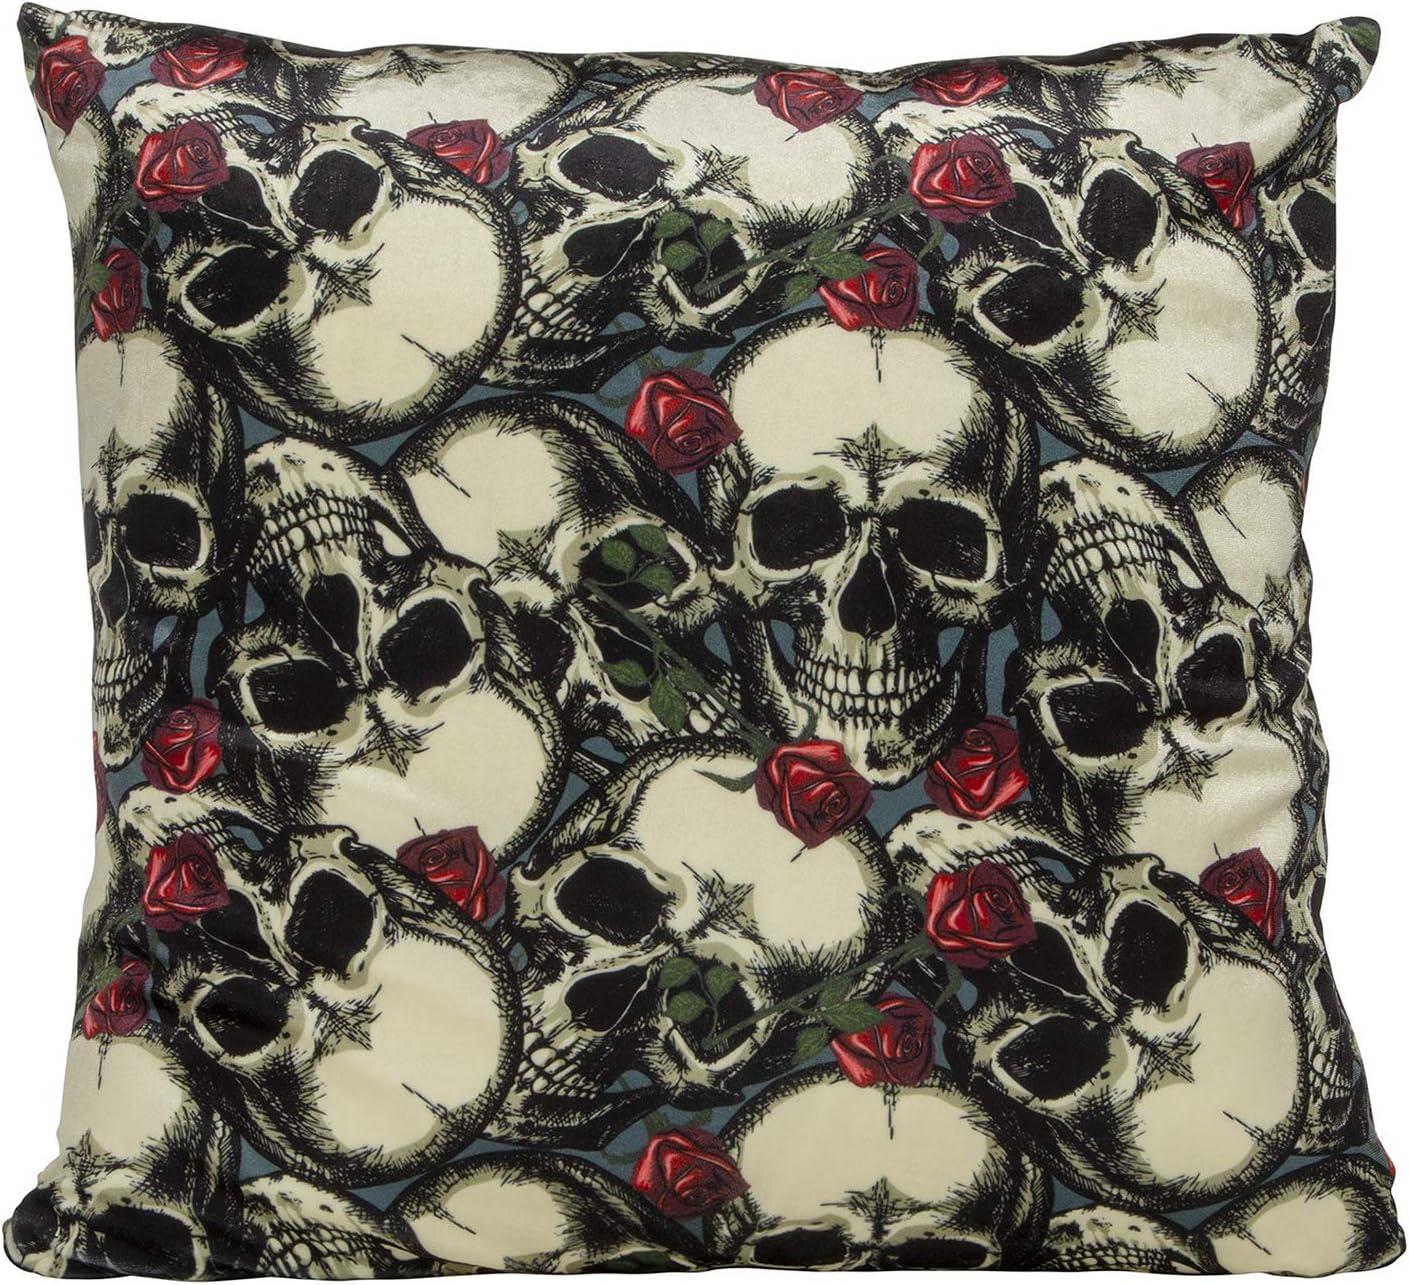 Decorative Velvet Skulls Roses 18 x 18 Inch Halloween Throw Pillow Cover Cushion Case